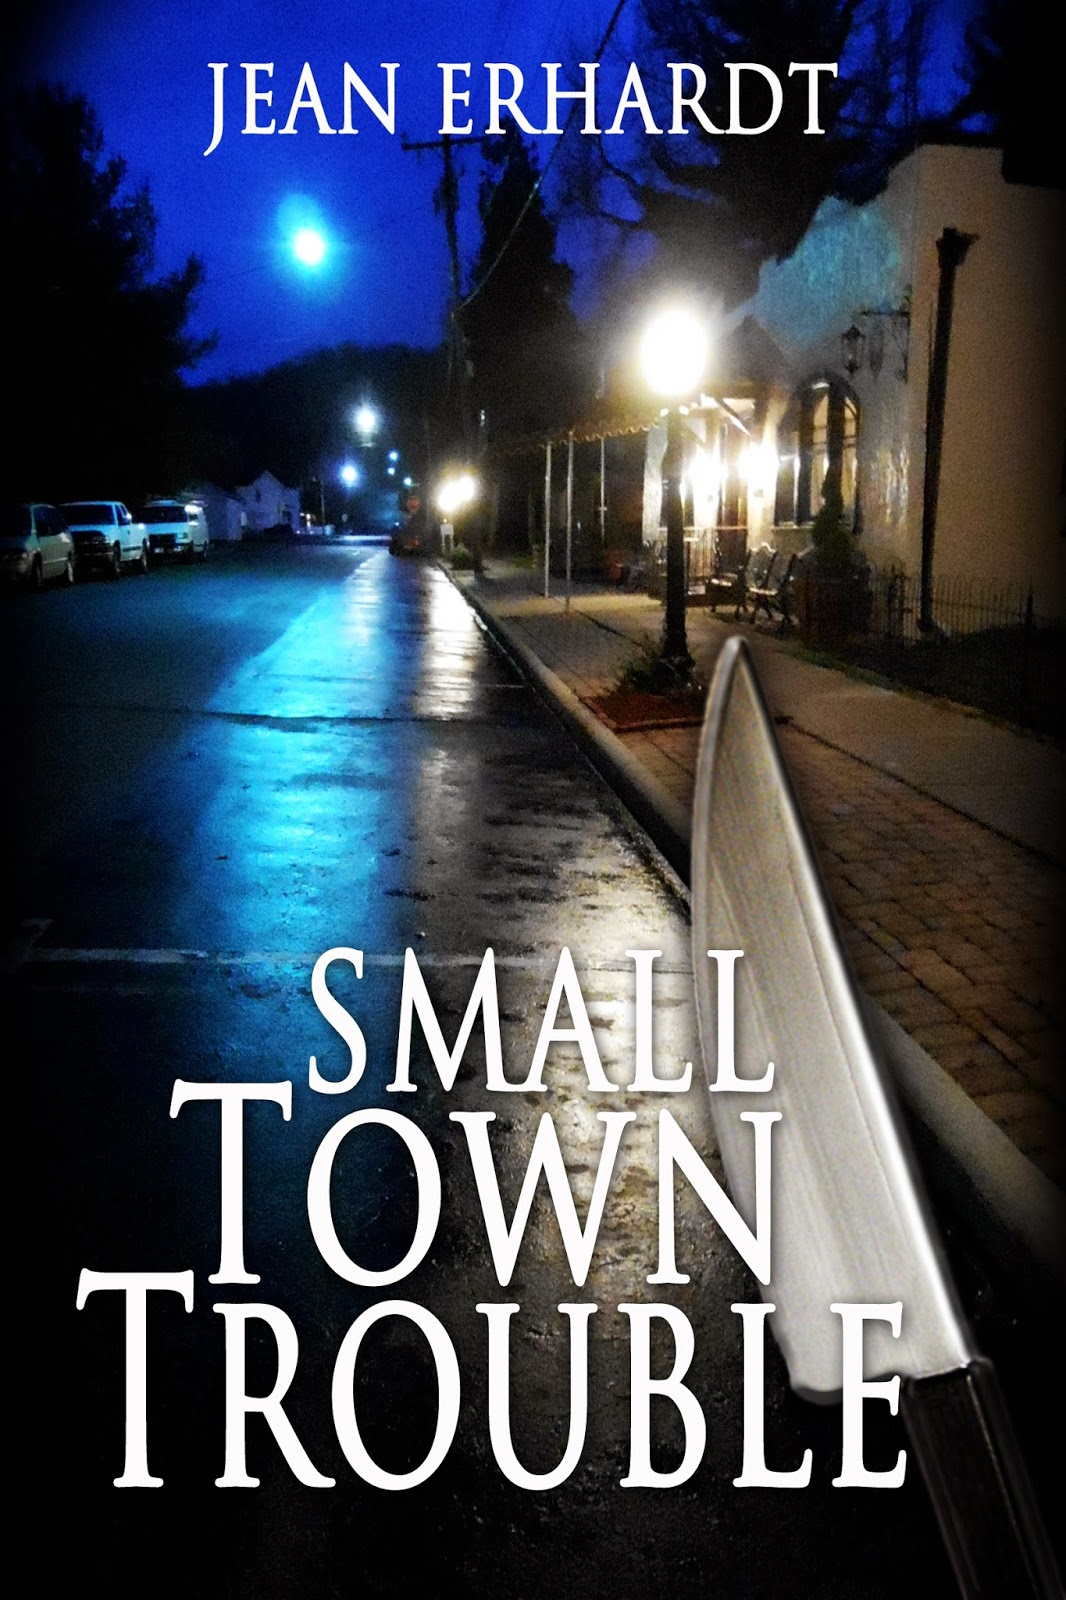 http://www.amazon.com/Small-Town-Trouble-Jean-Erhardt-ebook/dp/B00COEGW16/ref=la_B005IDH1YC_1_1?s=books&ie=UTF8&qid=1391453521&sr=1-1